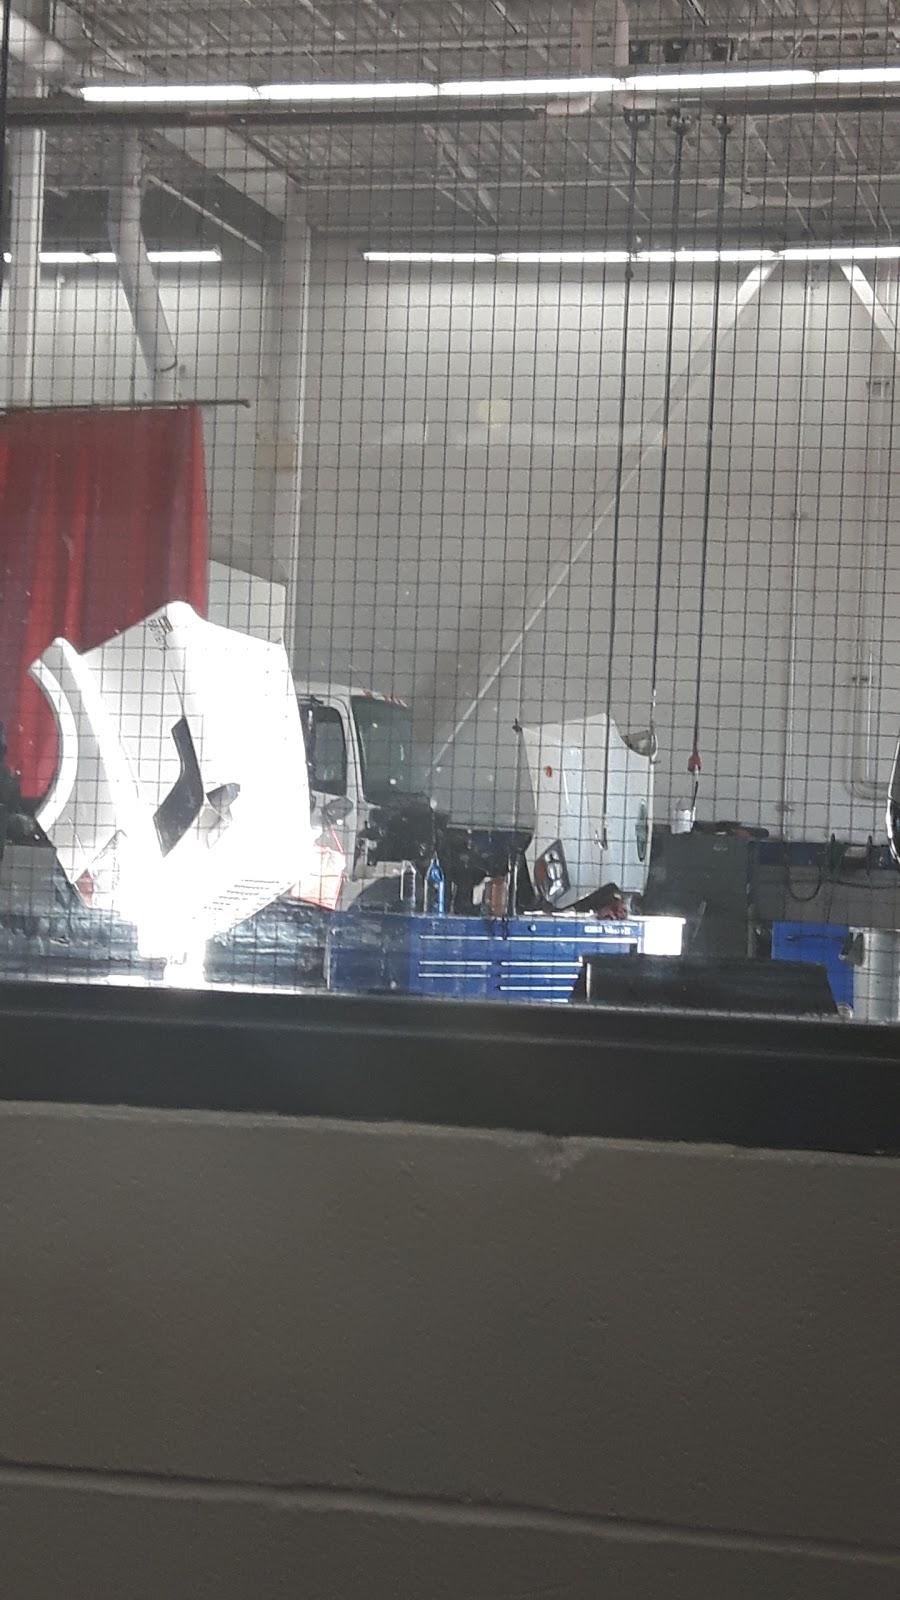 Penske Truck Rental | moving company | 850 Champlain Ave, Oshawa, ON L1J 8C3, Canada | 9054360171 OR +1 905-436-0171